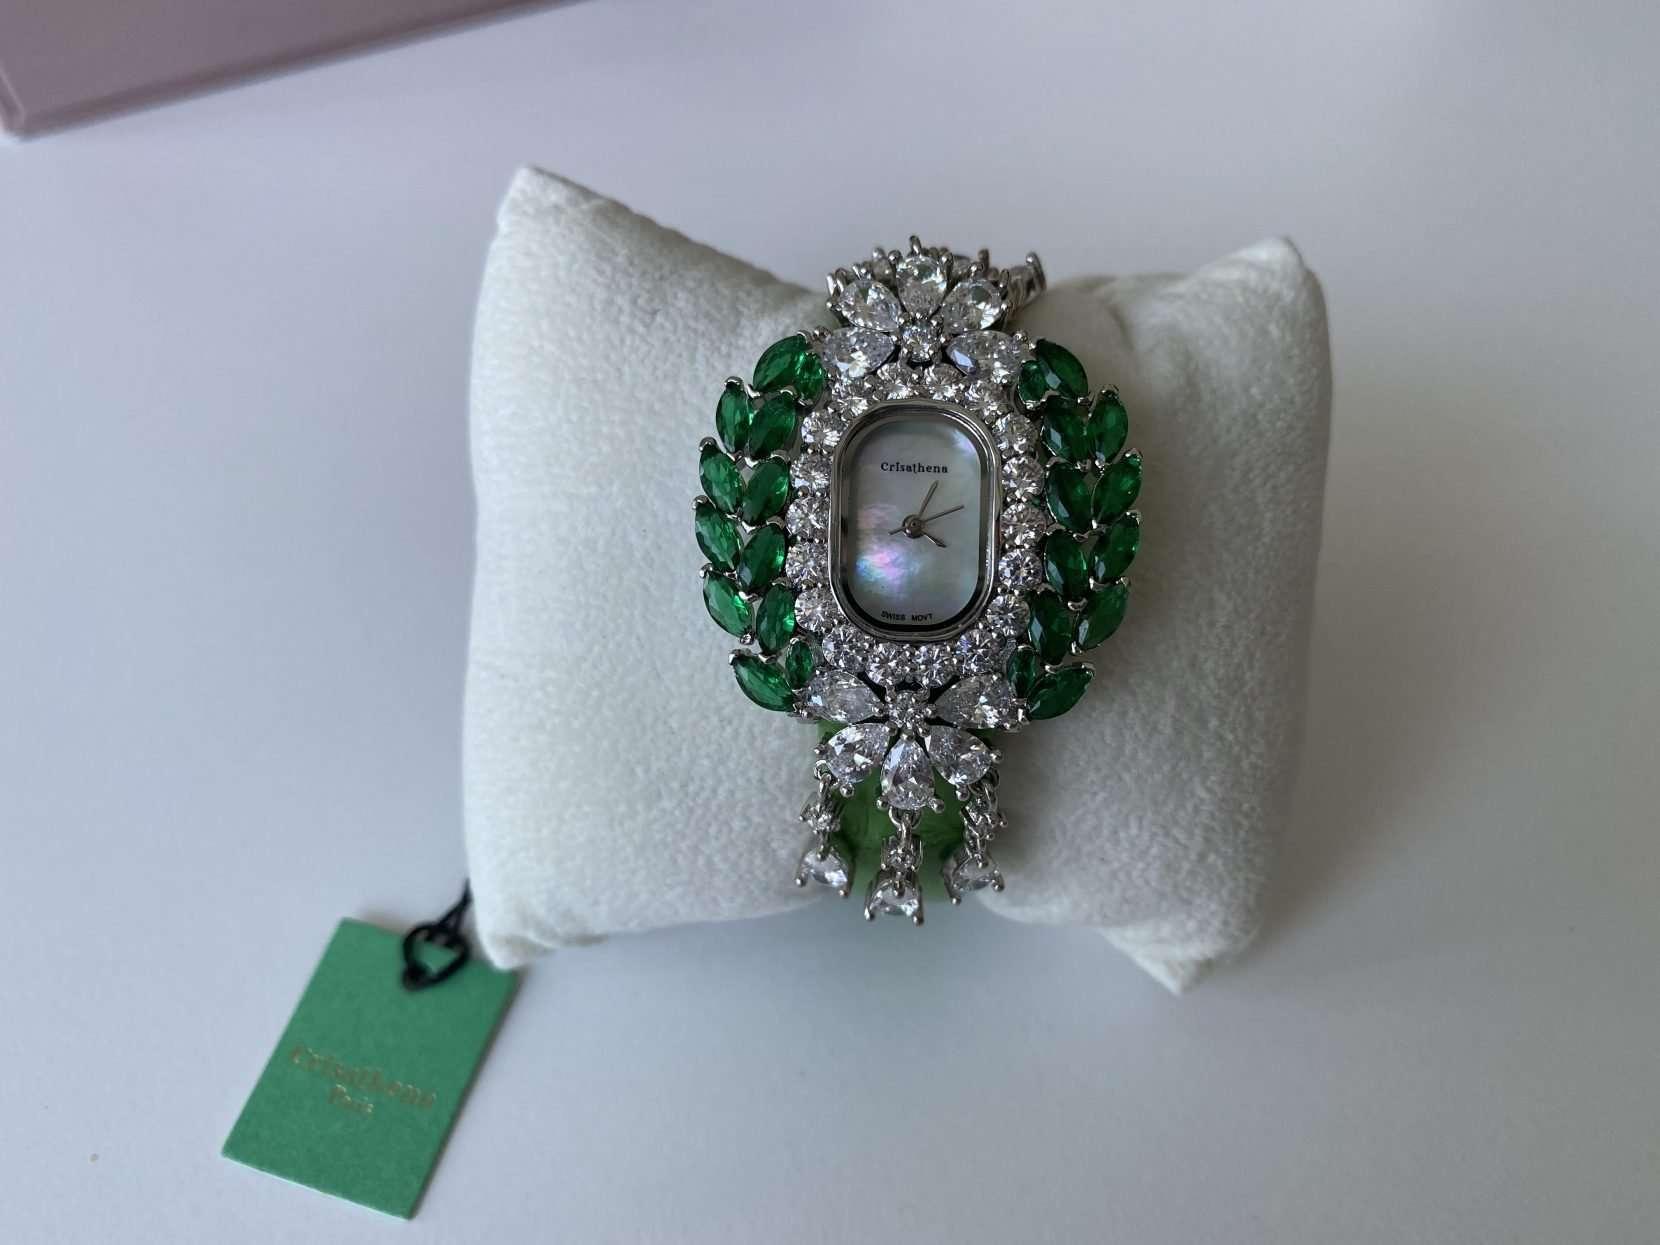 Crisathena luxury watch